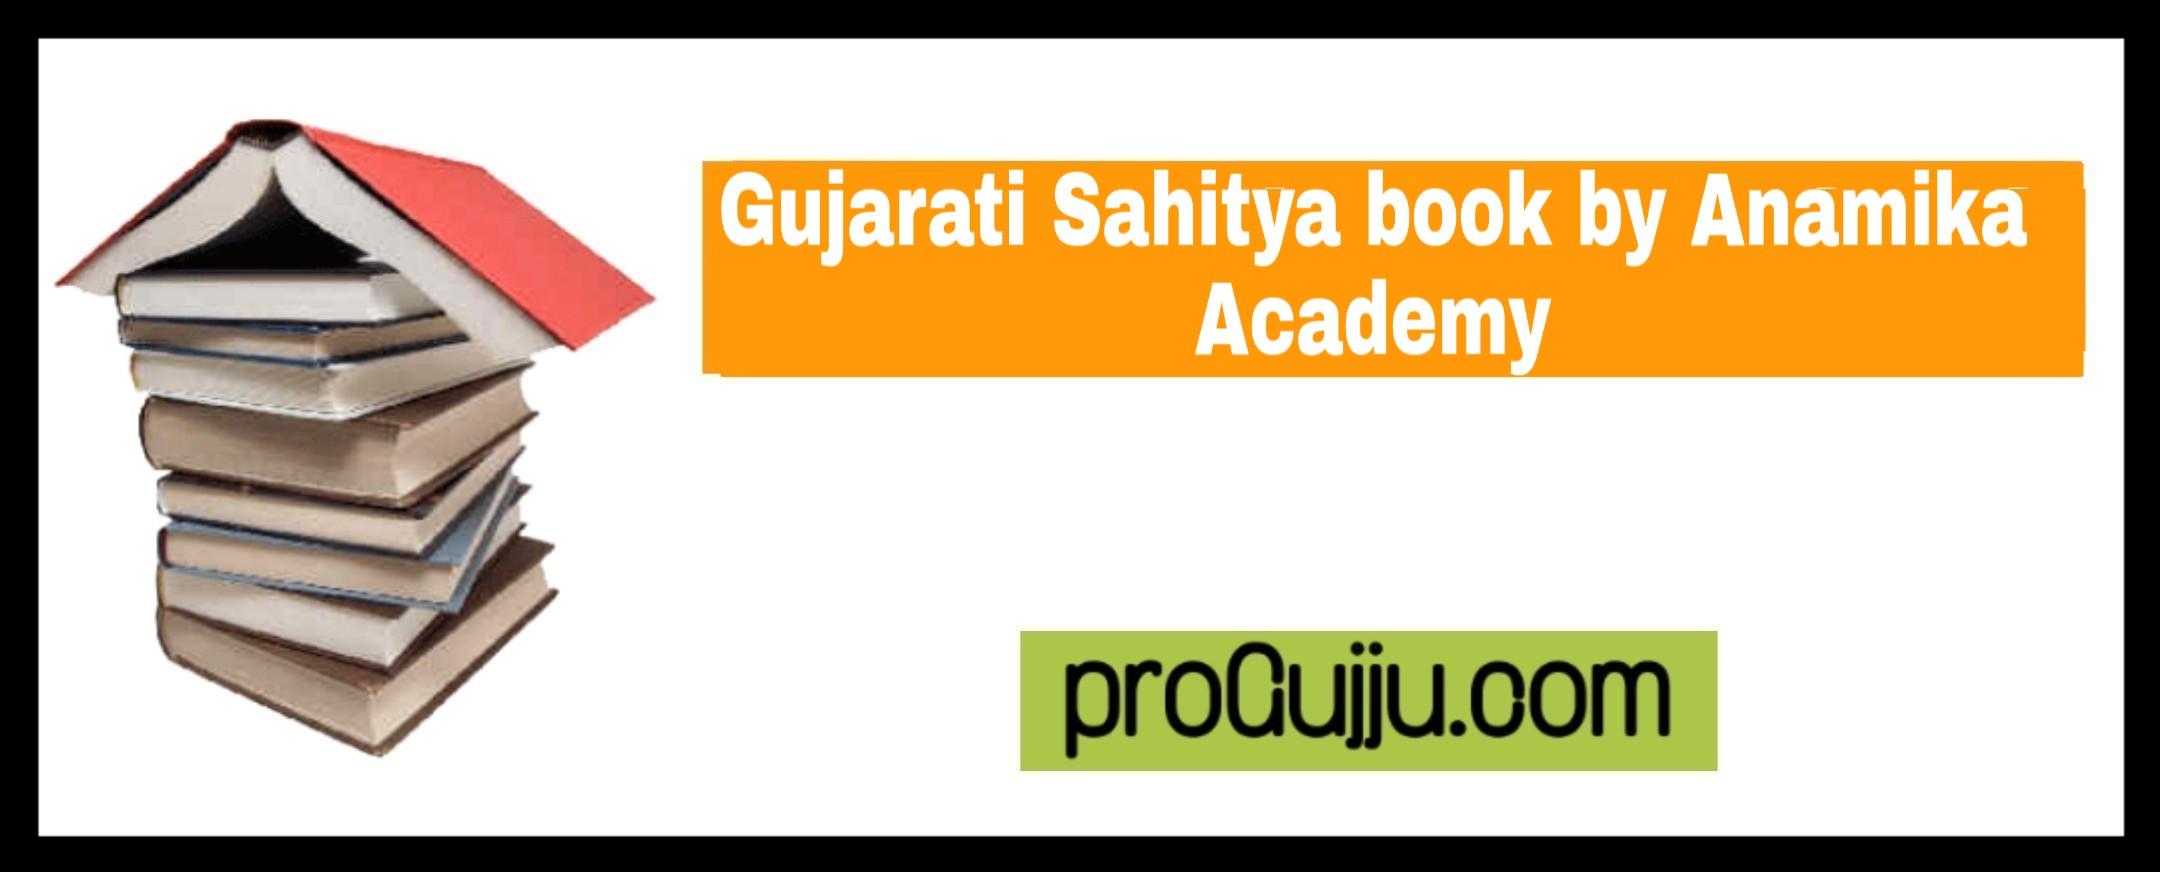 Gujarati Sahitya book by Anamika Academy